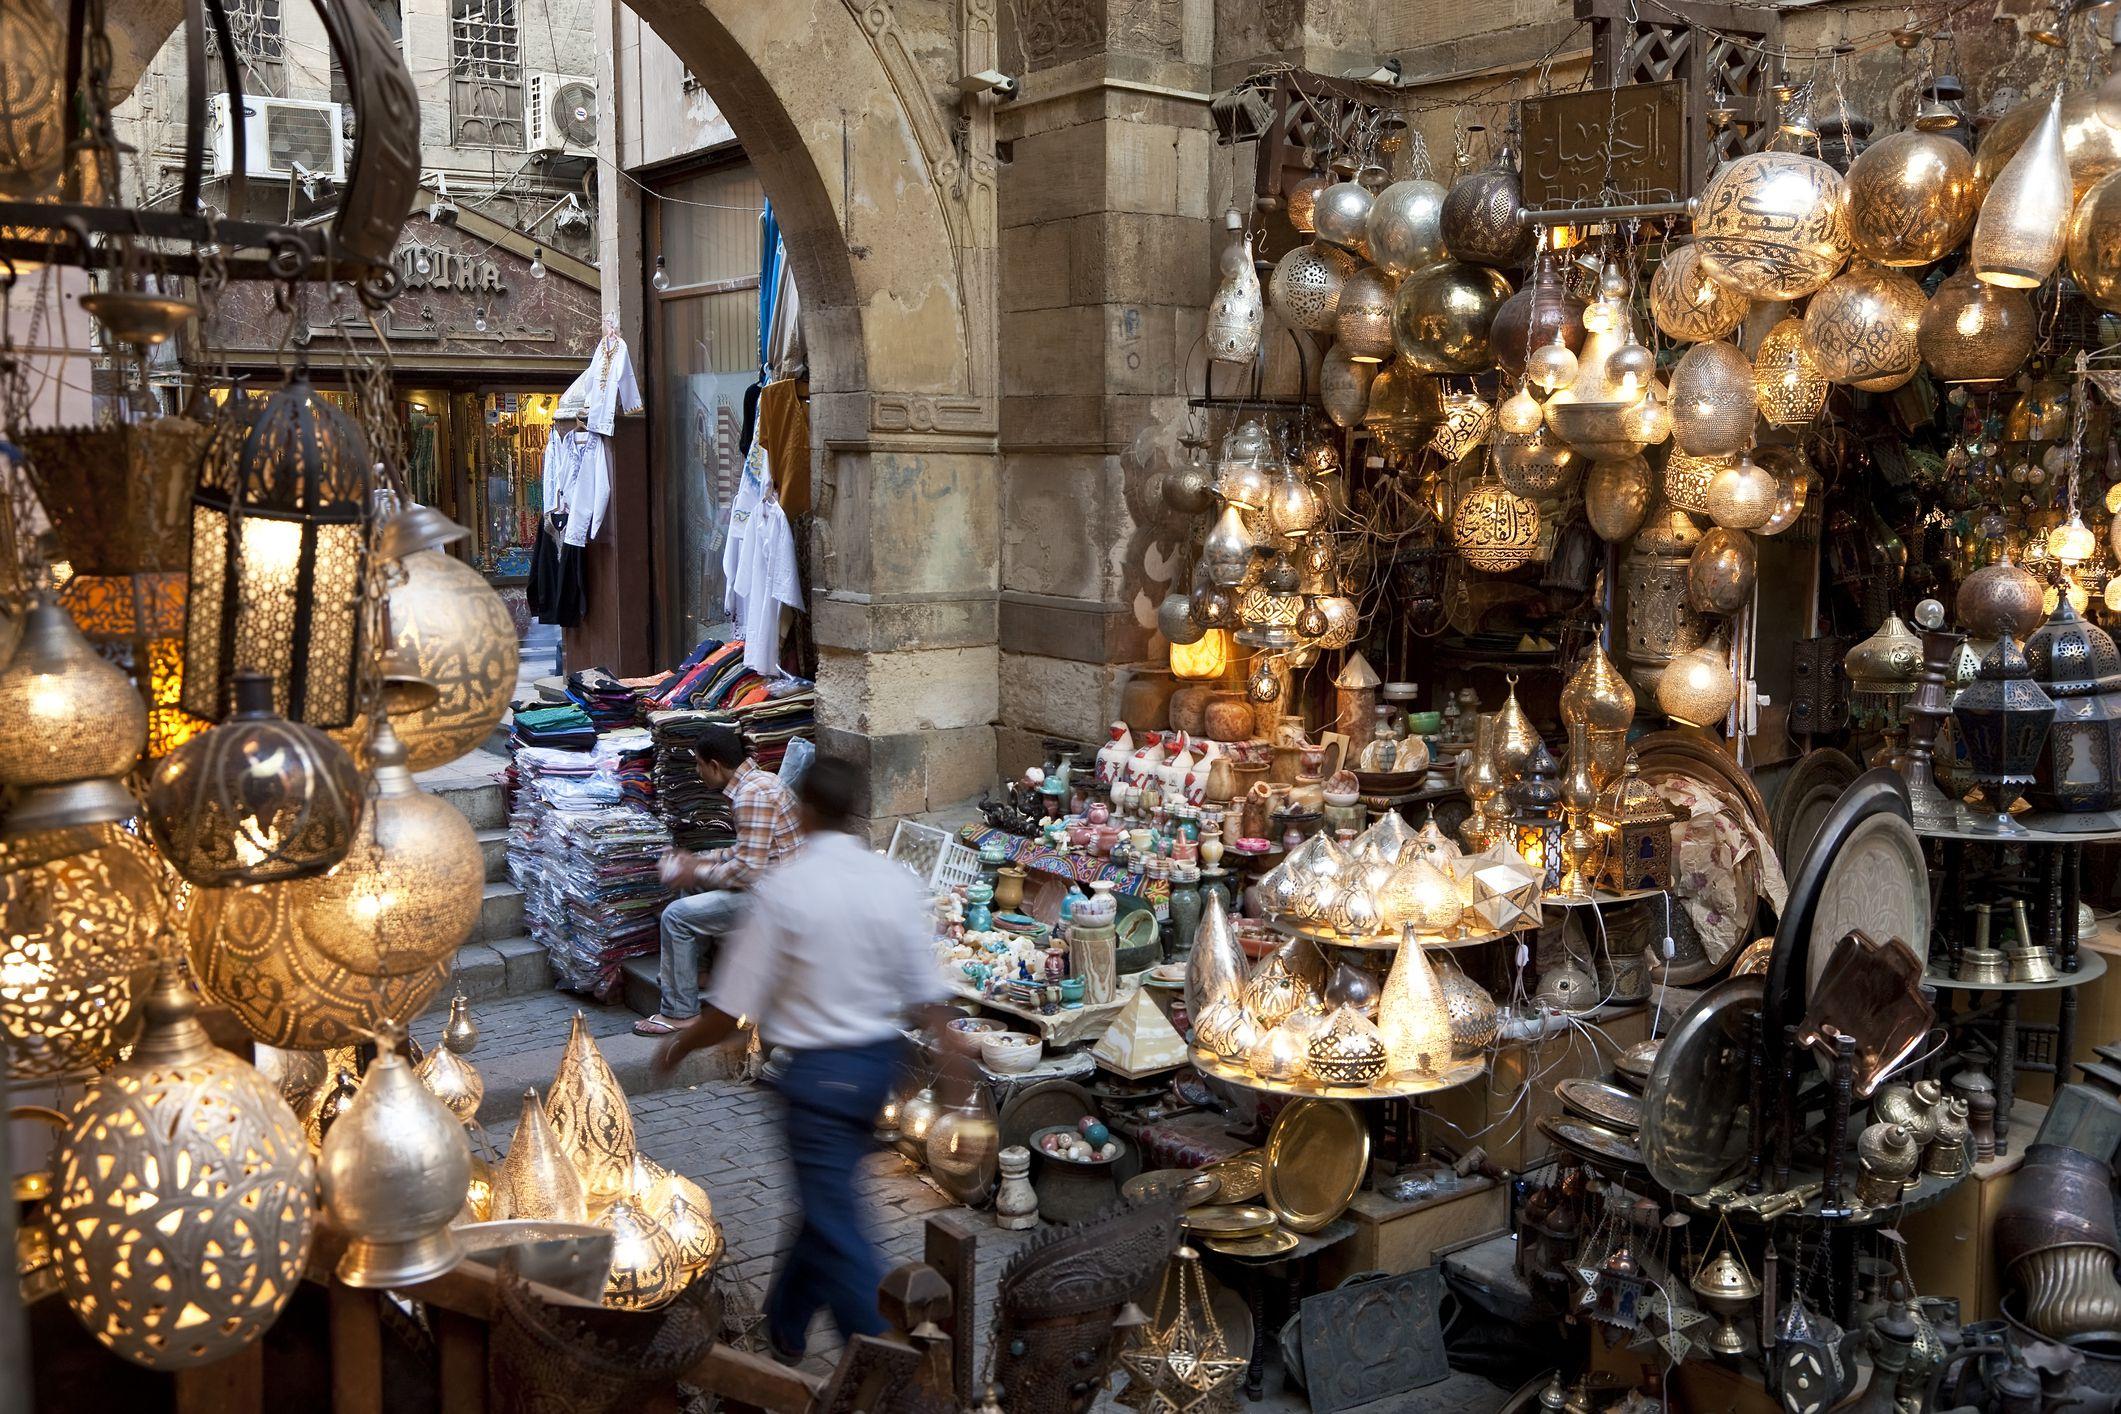 Khan al-Khalili bazaar in Cairo, Egypt